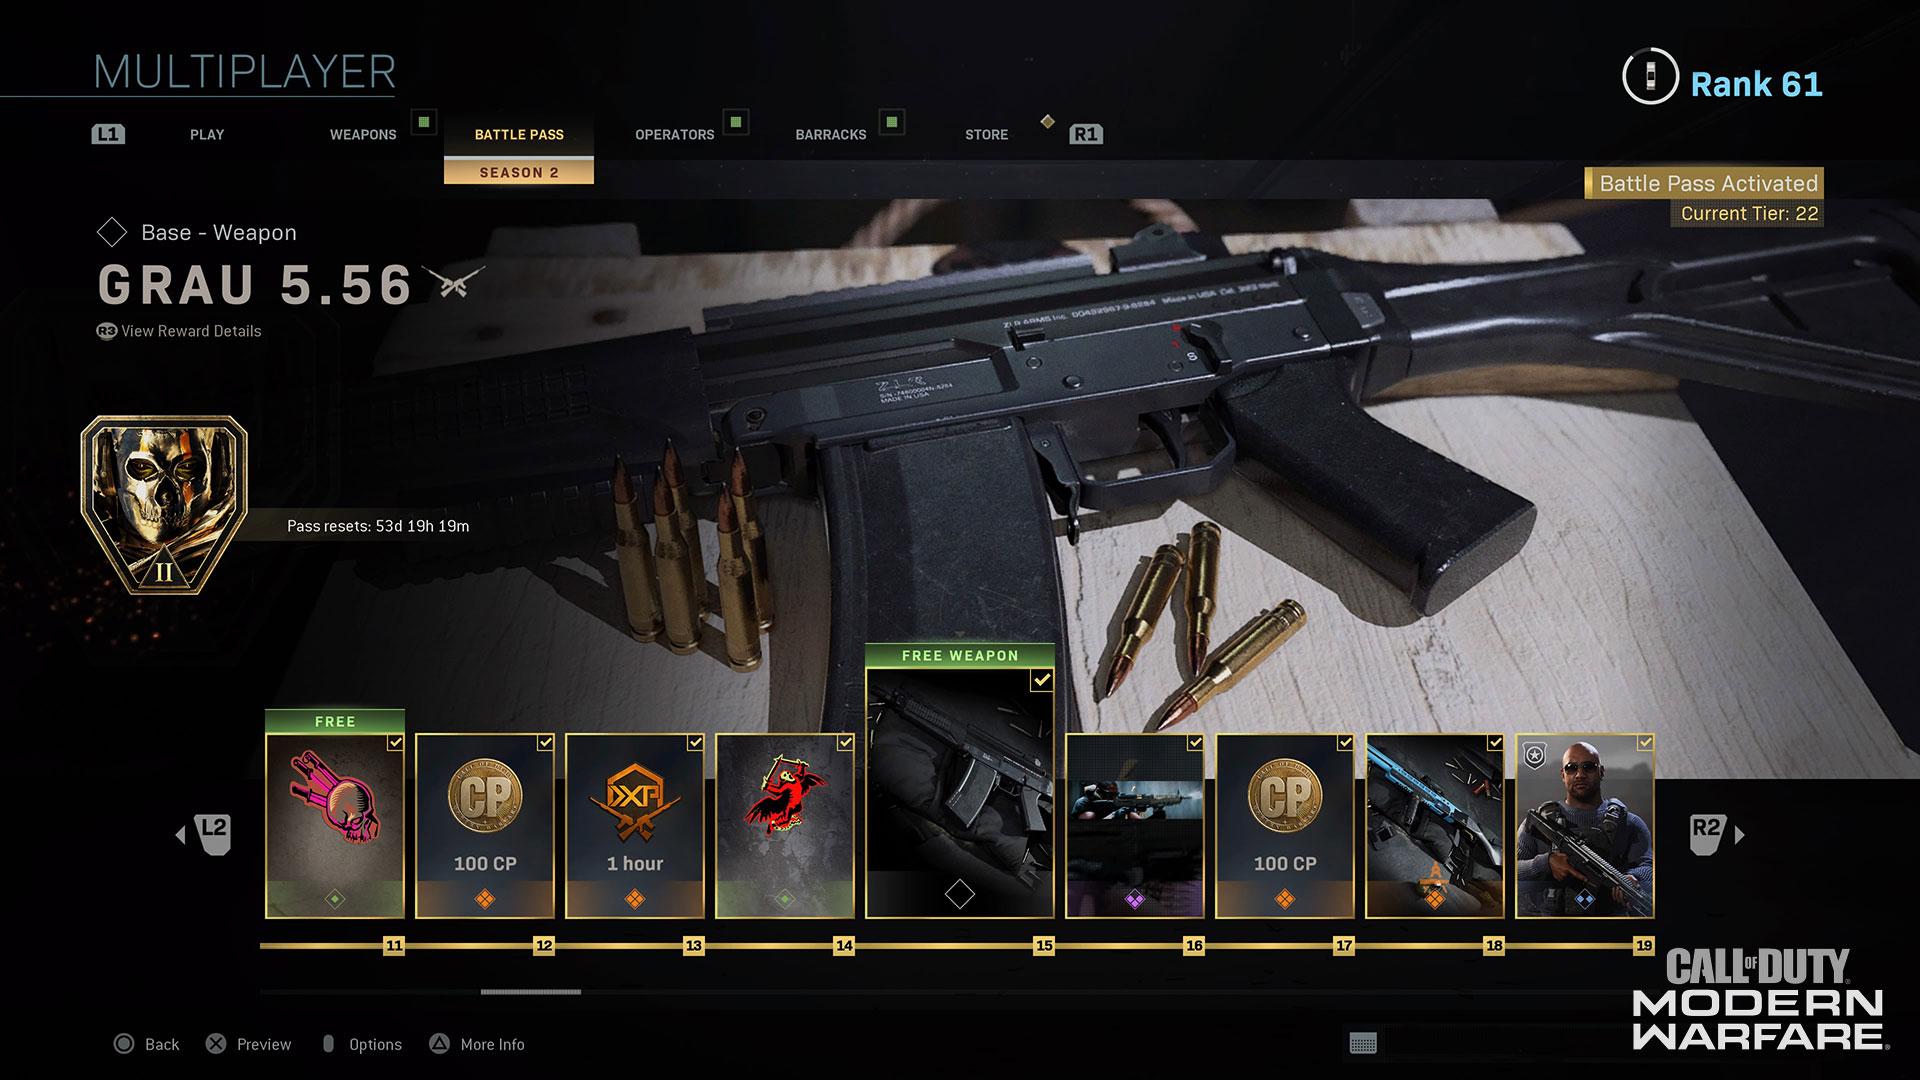 Modern Warfare Sesaon Two Battle Pass Grau